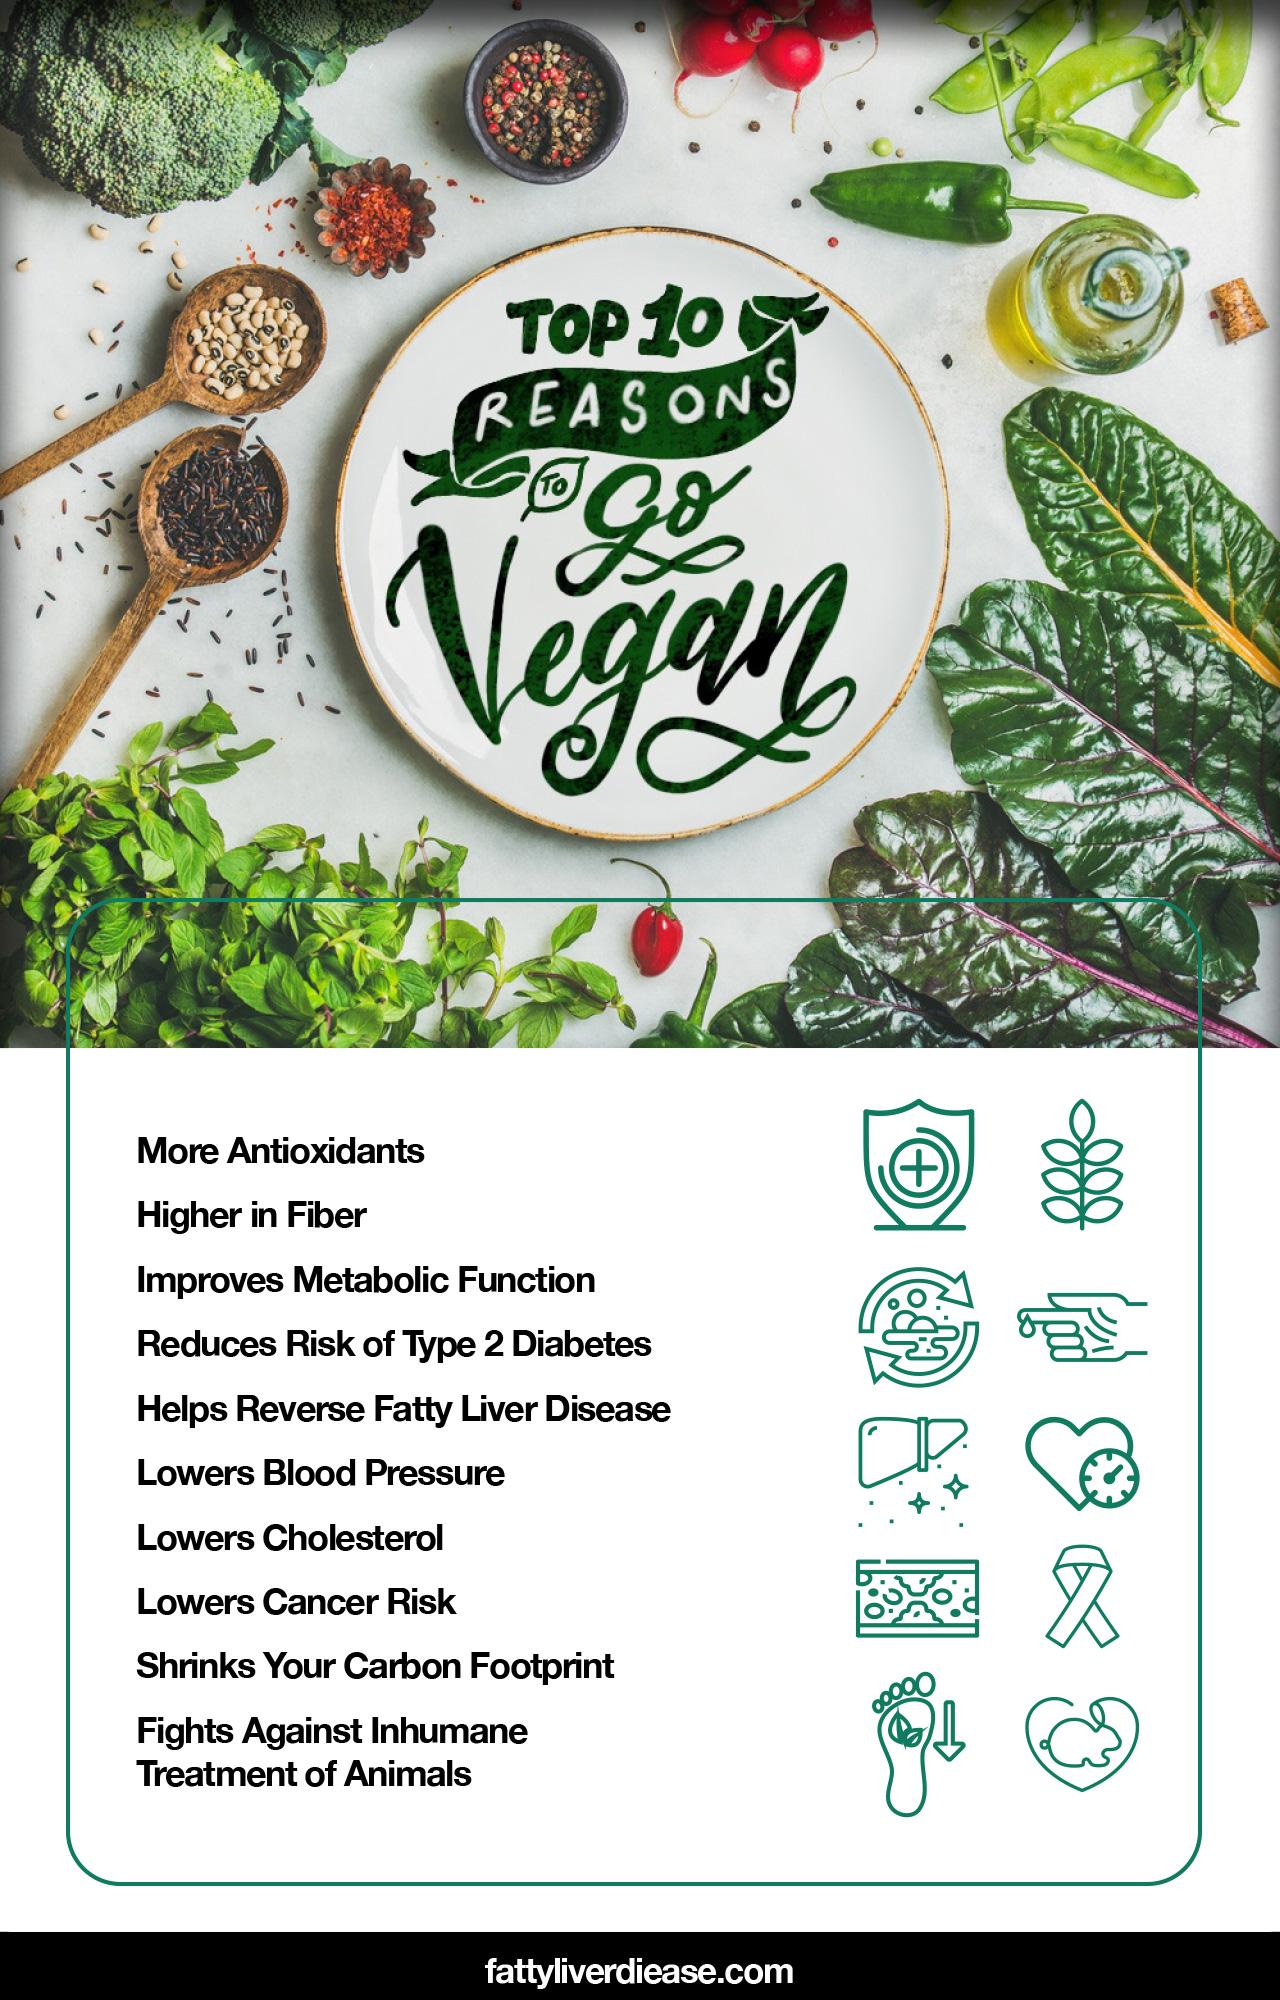 Top 10 Reasons to Go Vegan